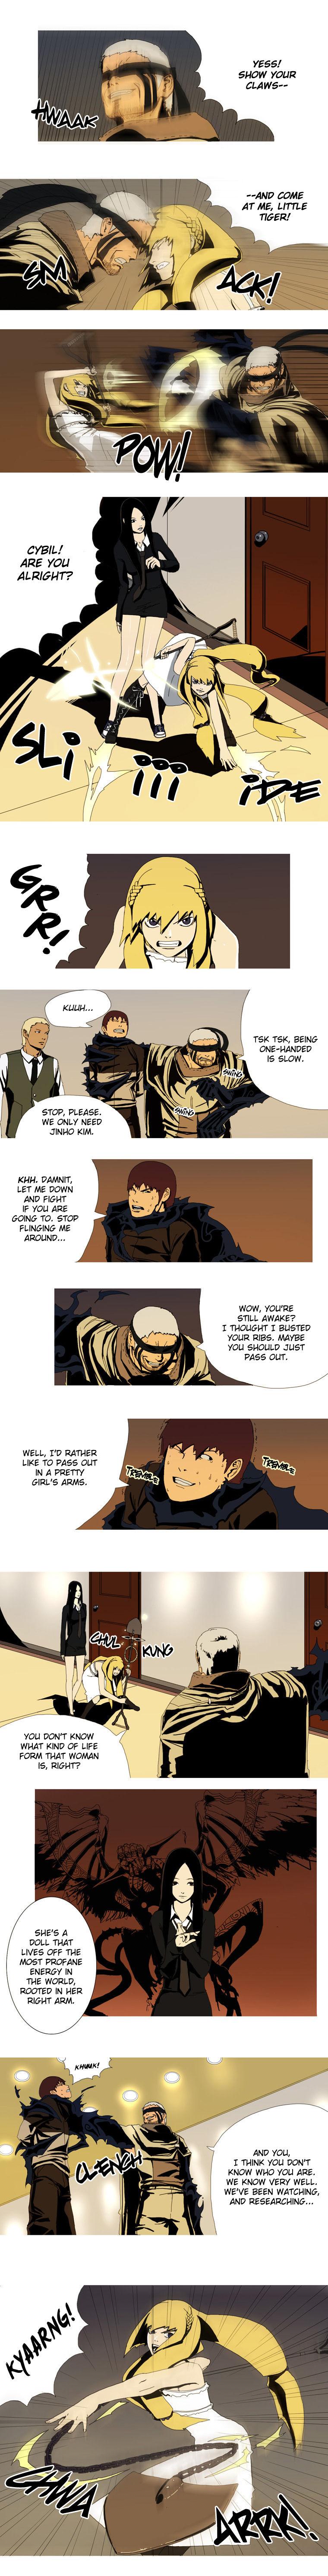 Treasure Hunter 14 Page 3